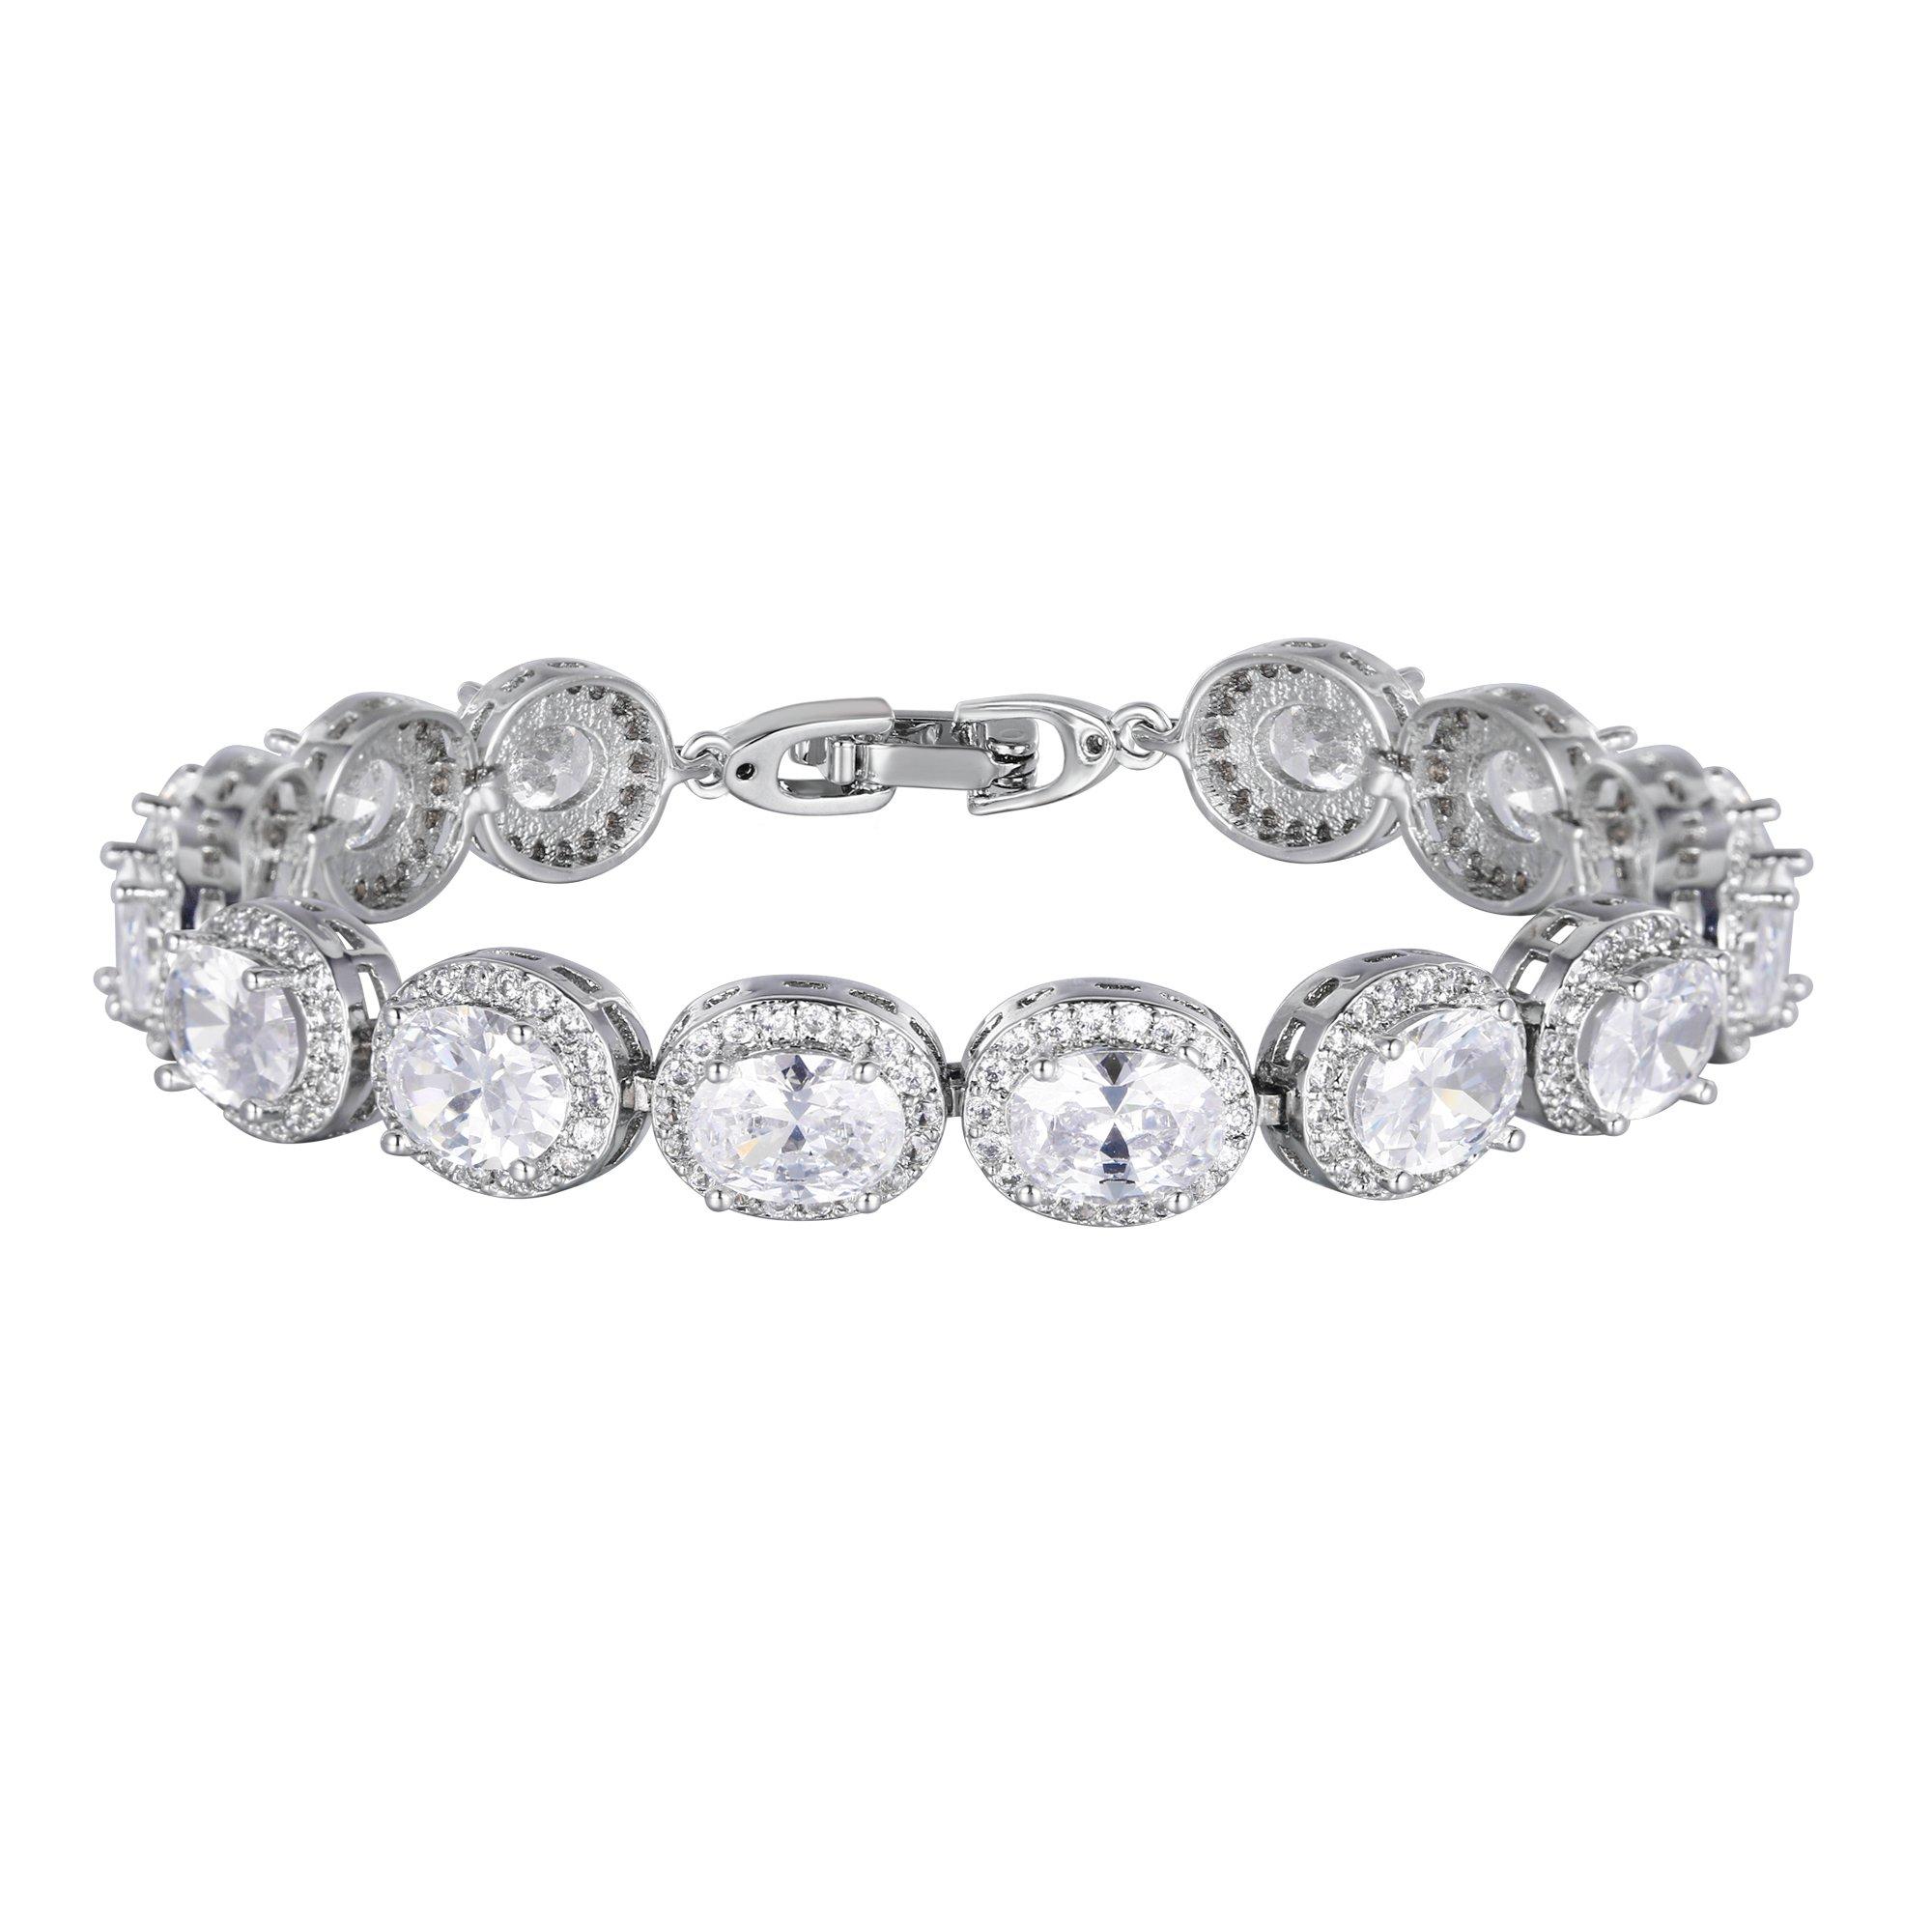 EVER FAITH Glamorous Oval-Cut Cubic Zirconia Bridal Tennis Bracelet for Brides & Bridesmaids